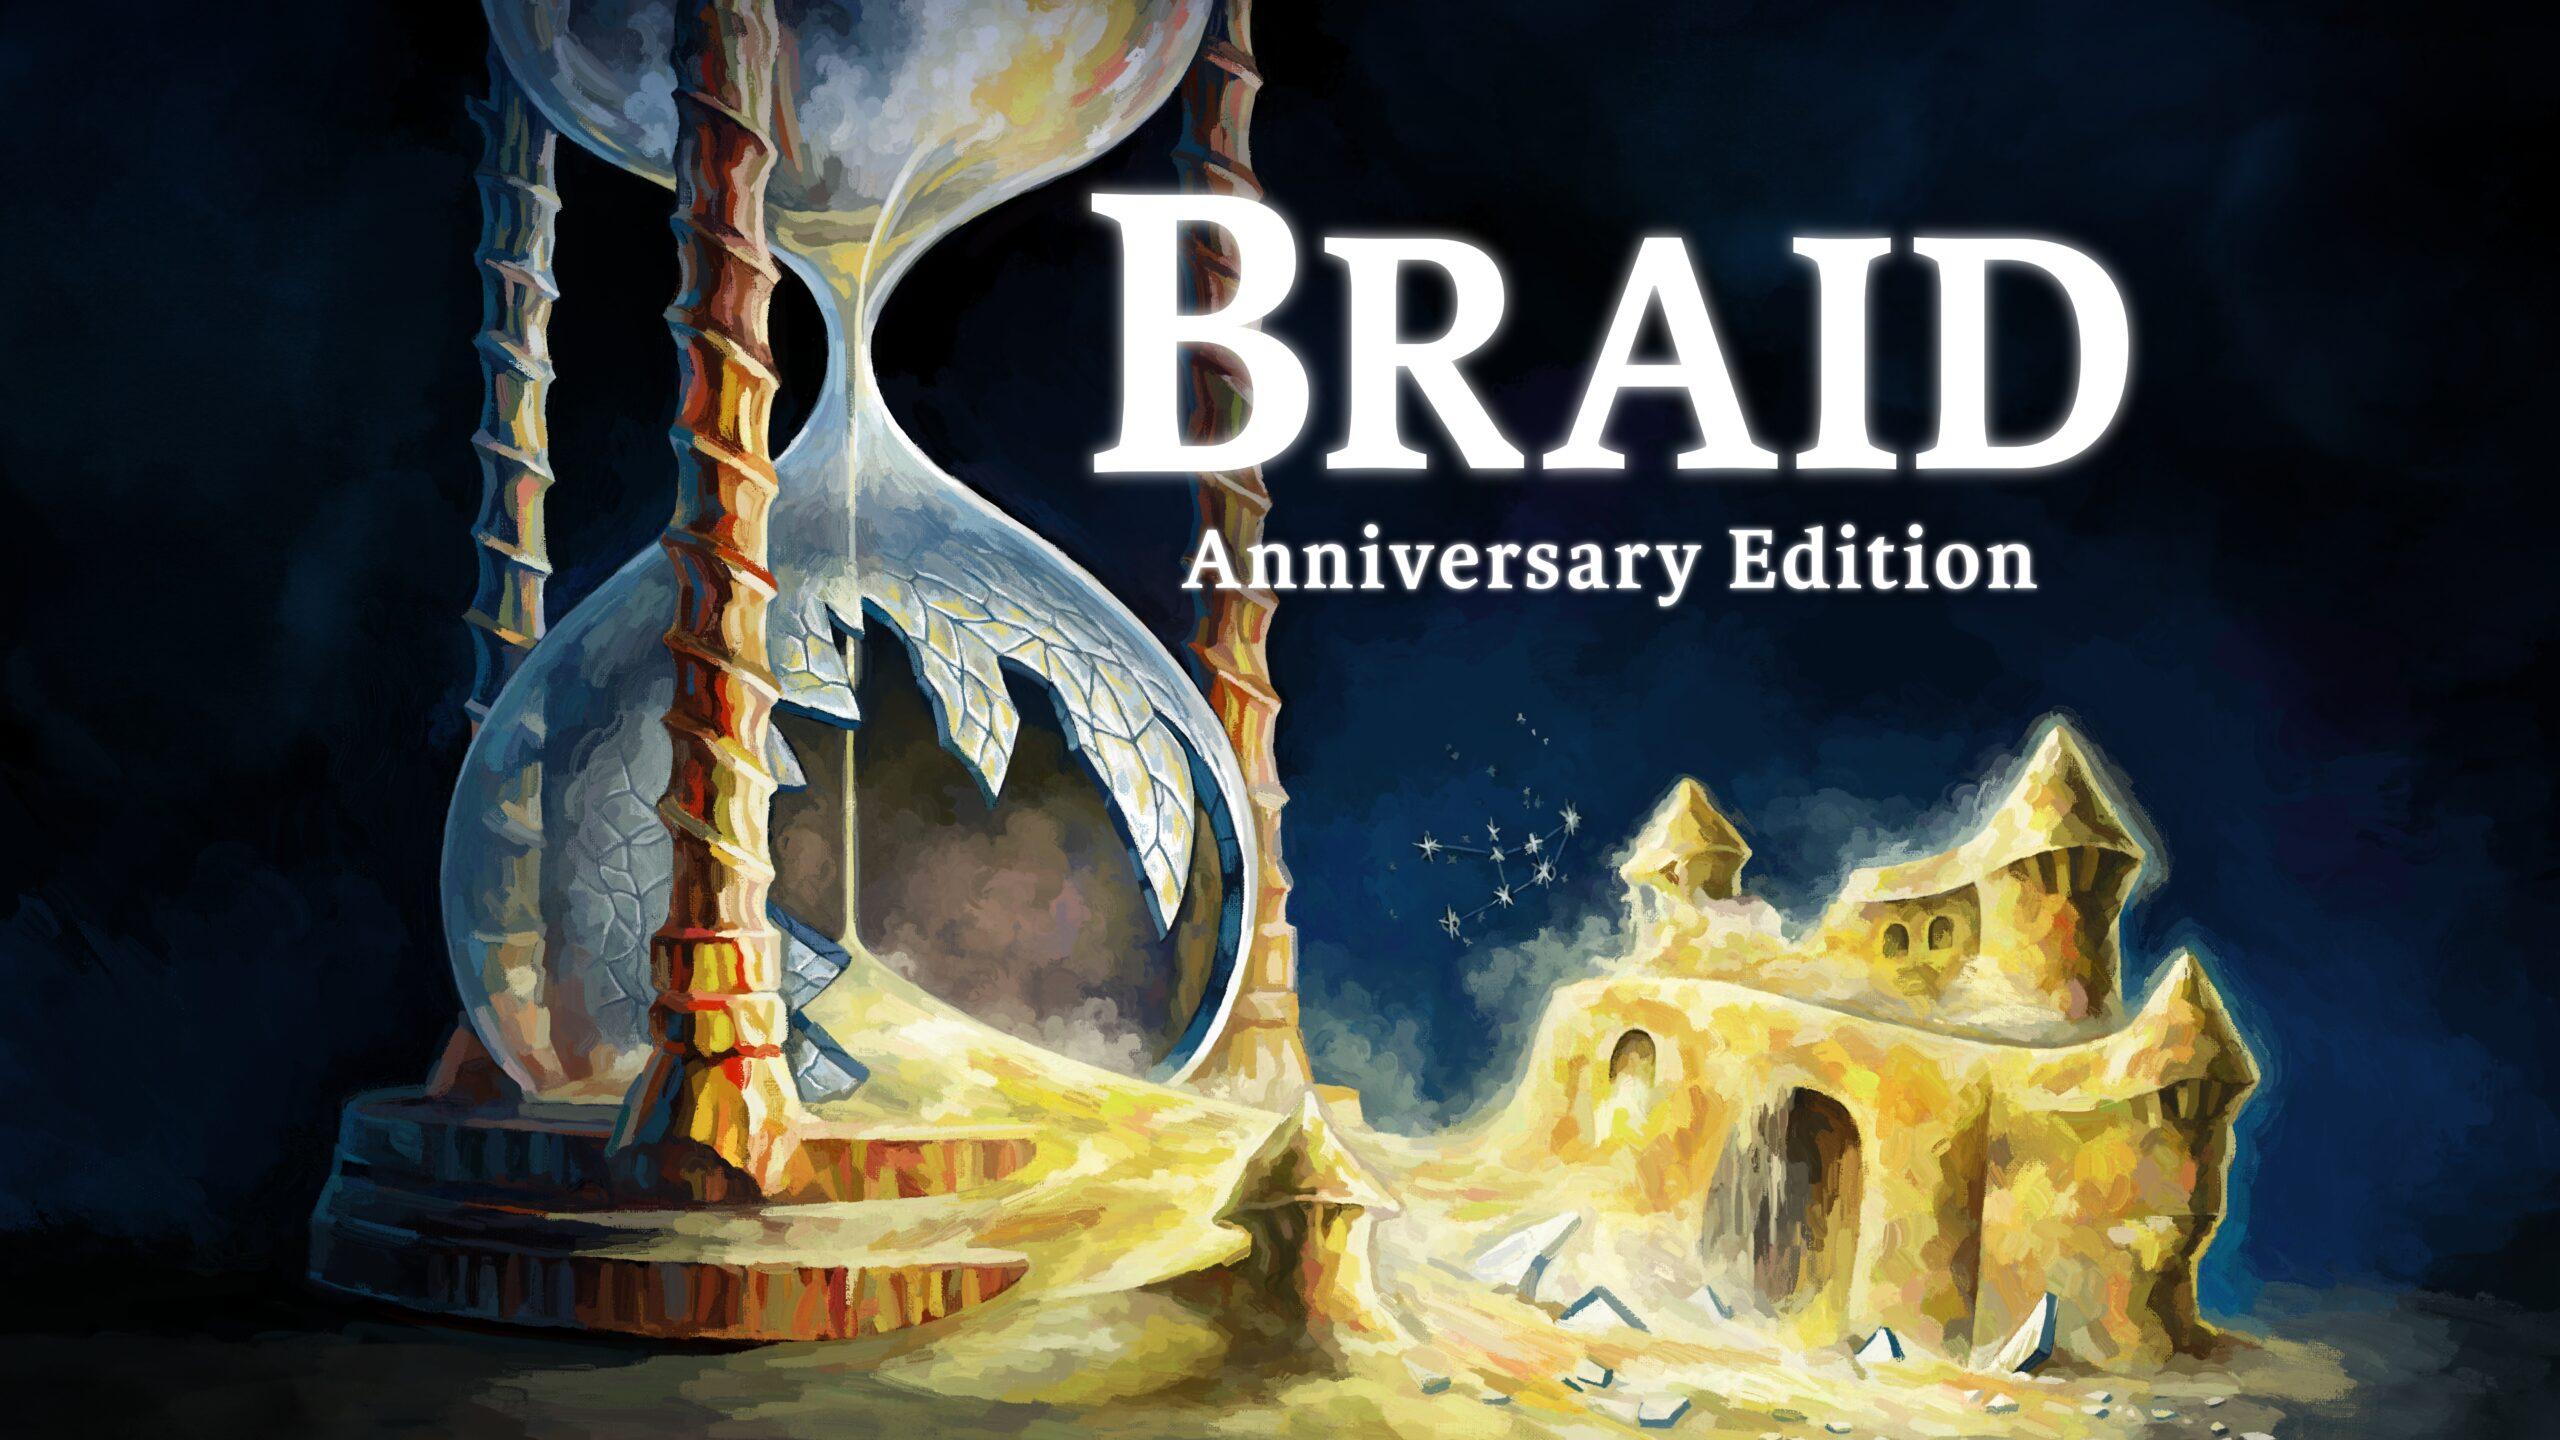 Braid-Anniversary-Edition_2020_08-06-20_008